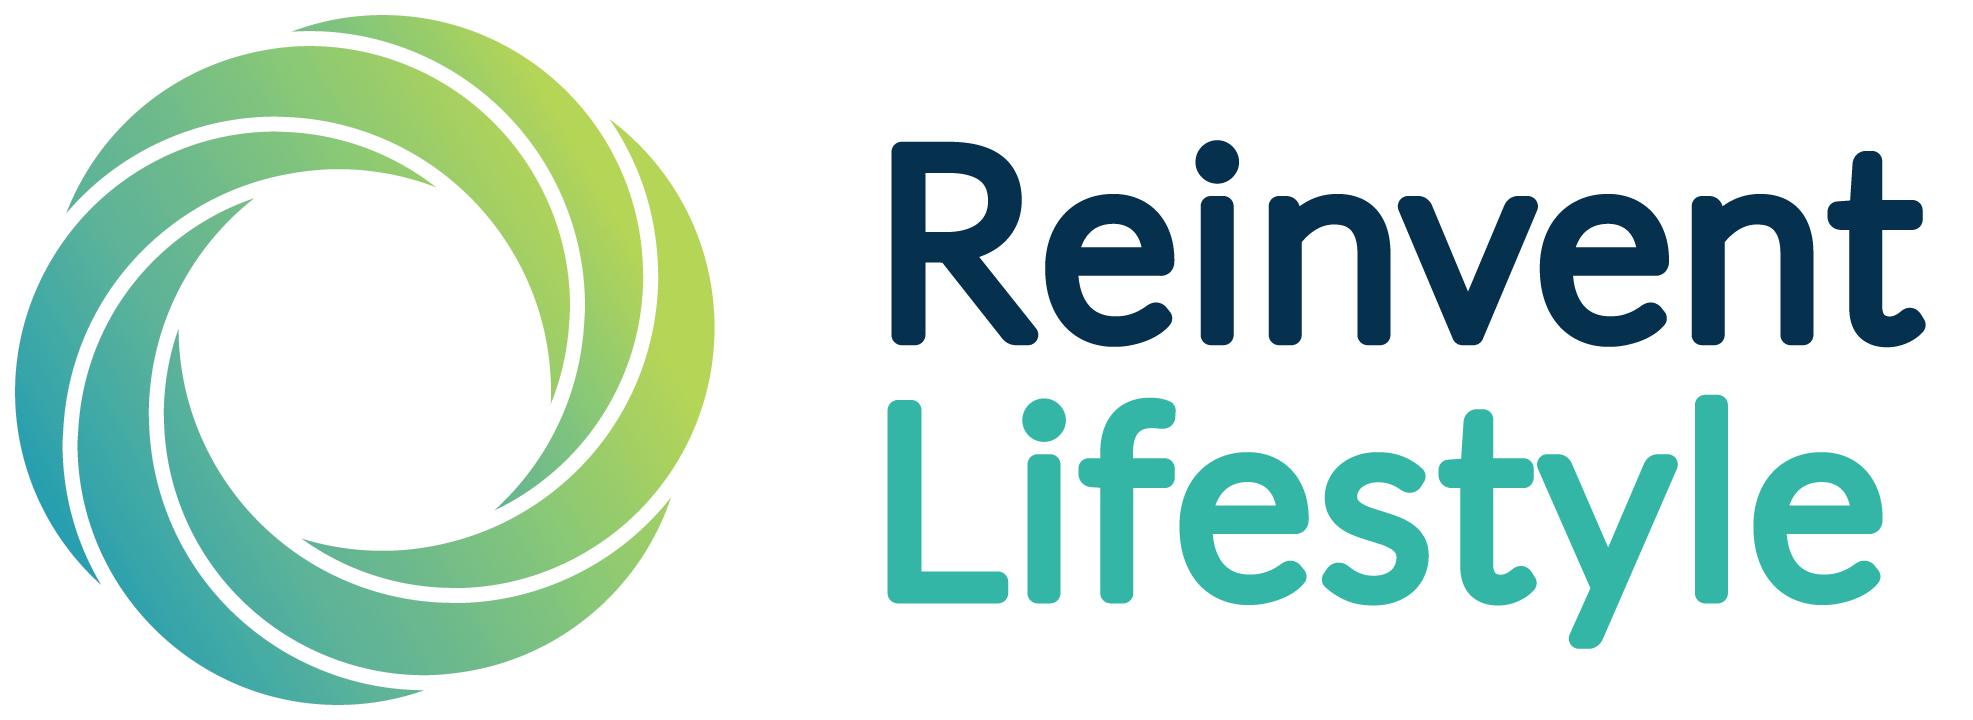 Reinvent Lifestyle